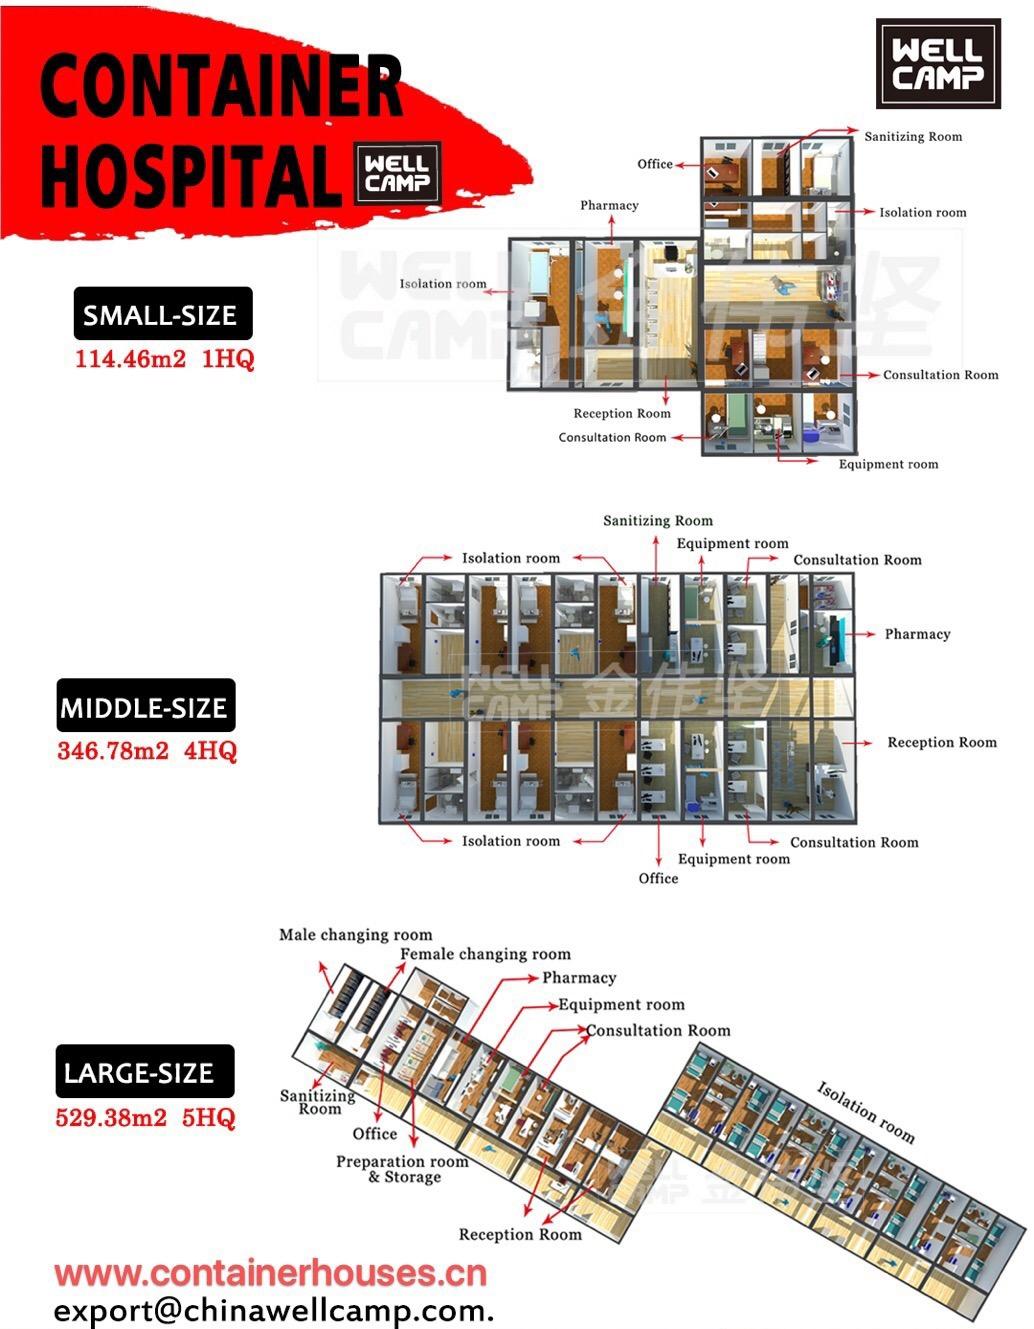 product-WELLCAMP-Prefabcriated Expandable Container Hospital for Coronavirus Isolation Quarantine-im